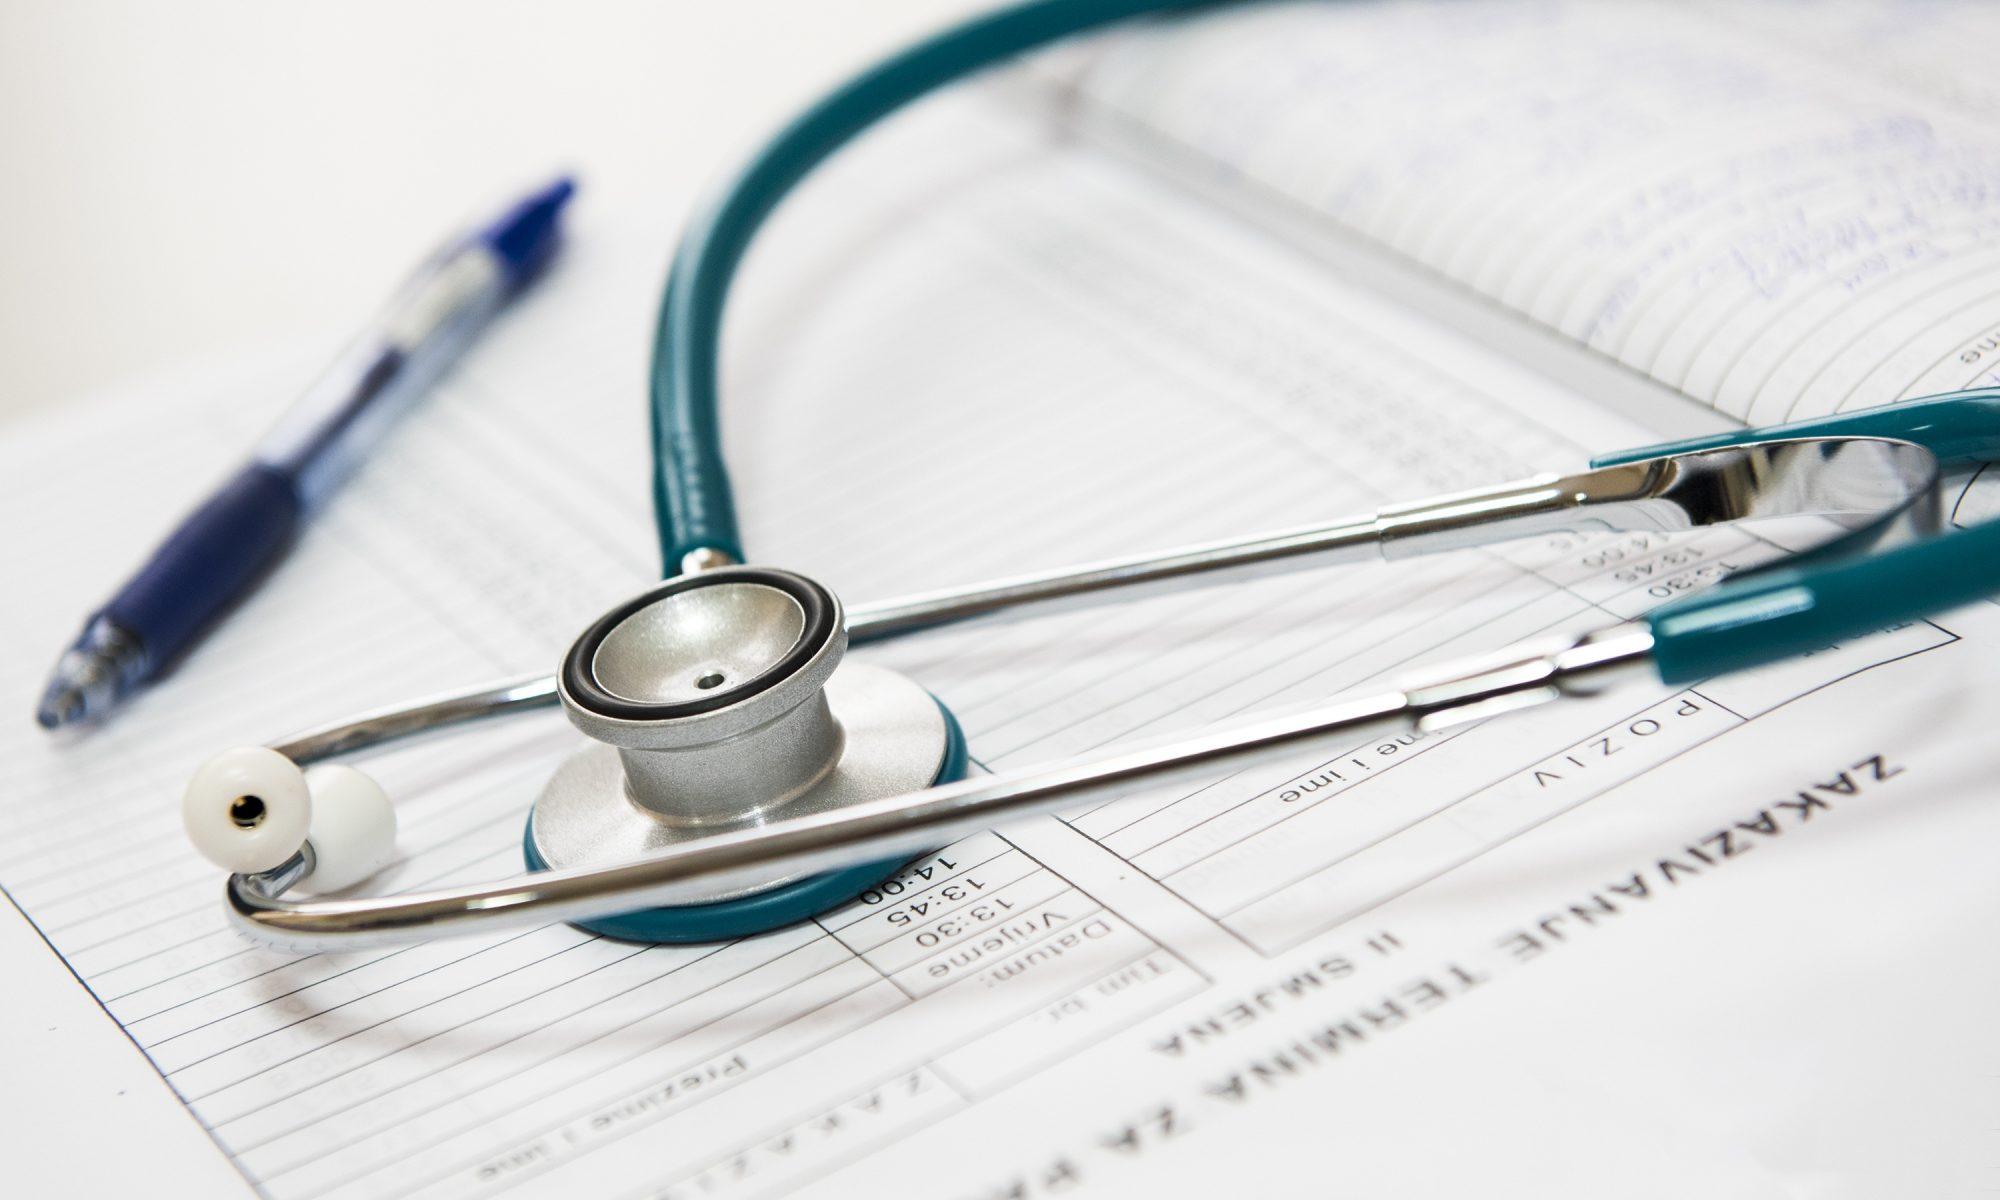 The Emergent Medical Tourism & Medical Tourism Benefits